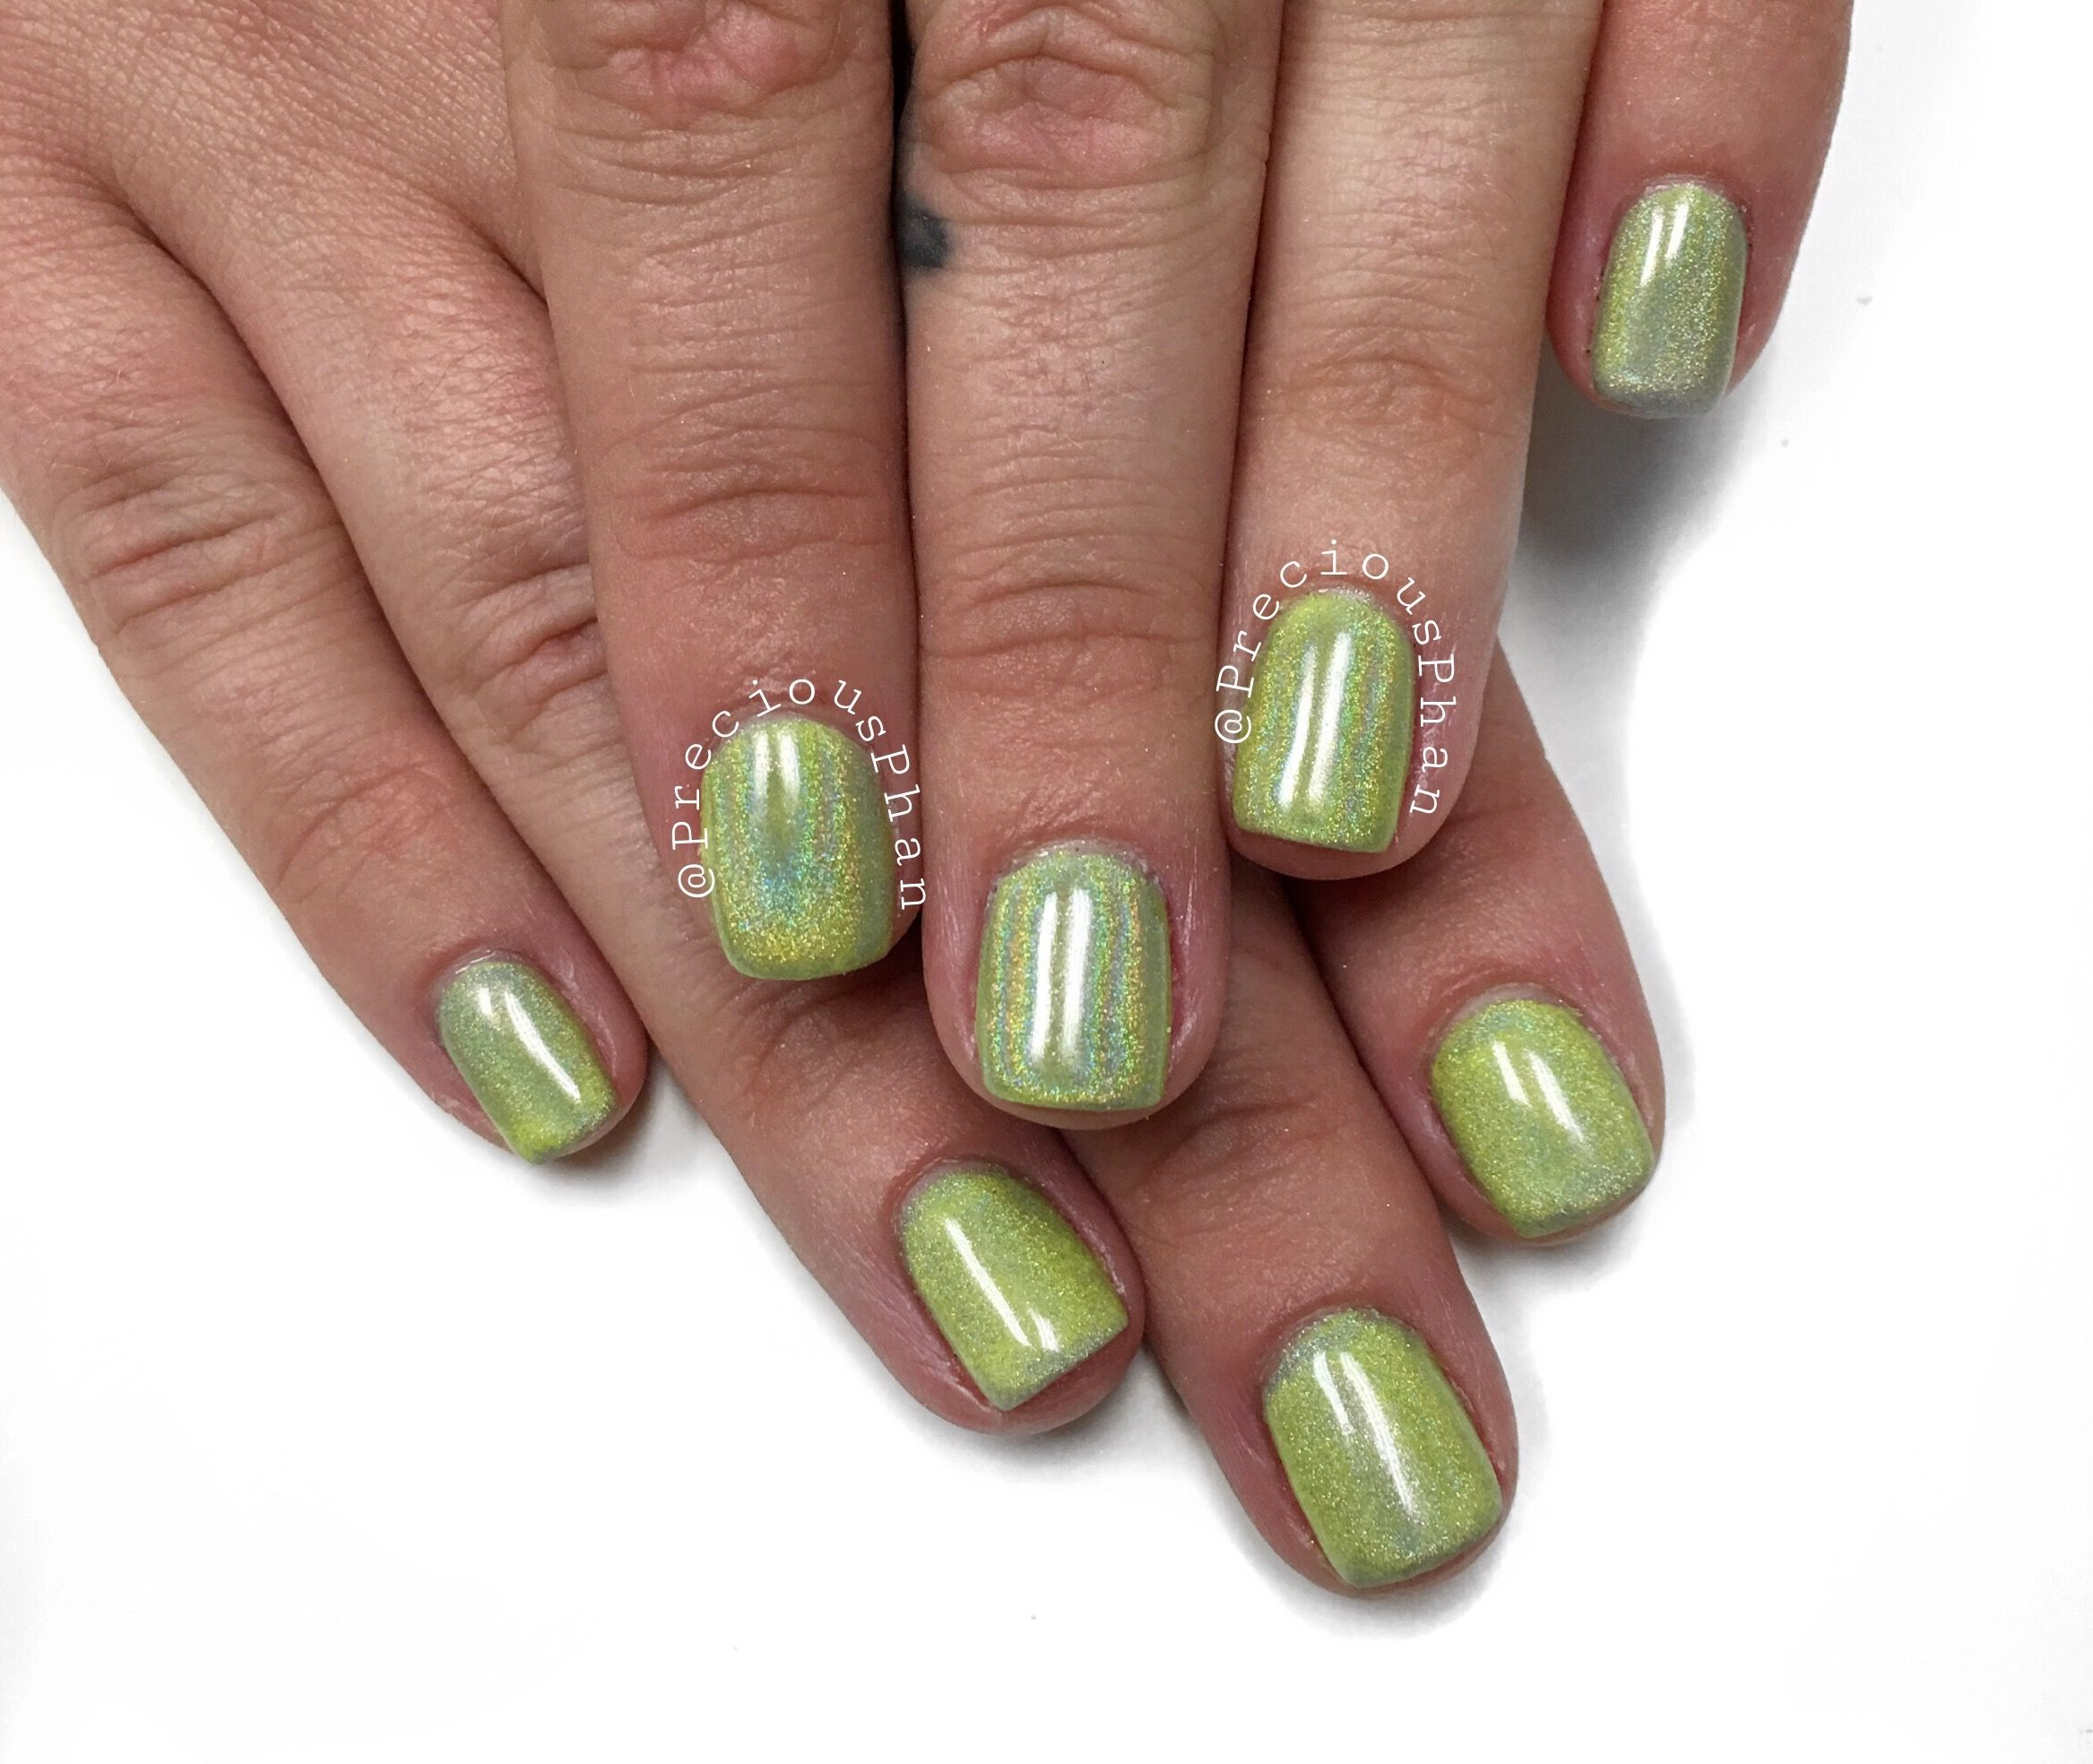 Holographic nails. Neon yellow nails. Chrome nails. #PreciousPhan ...